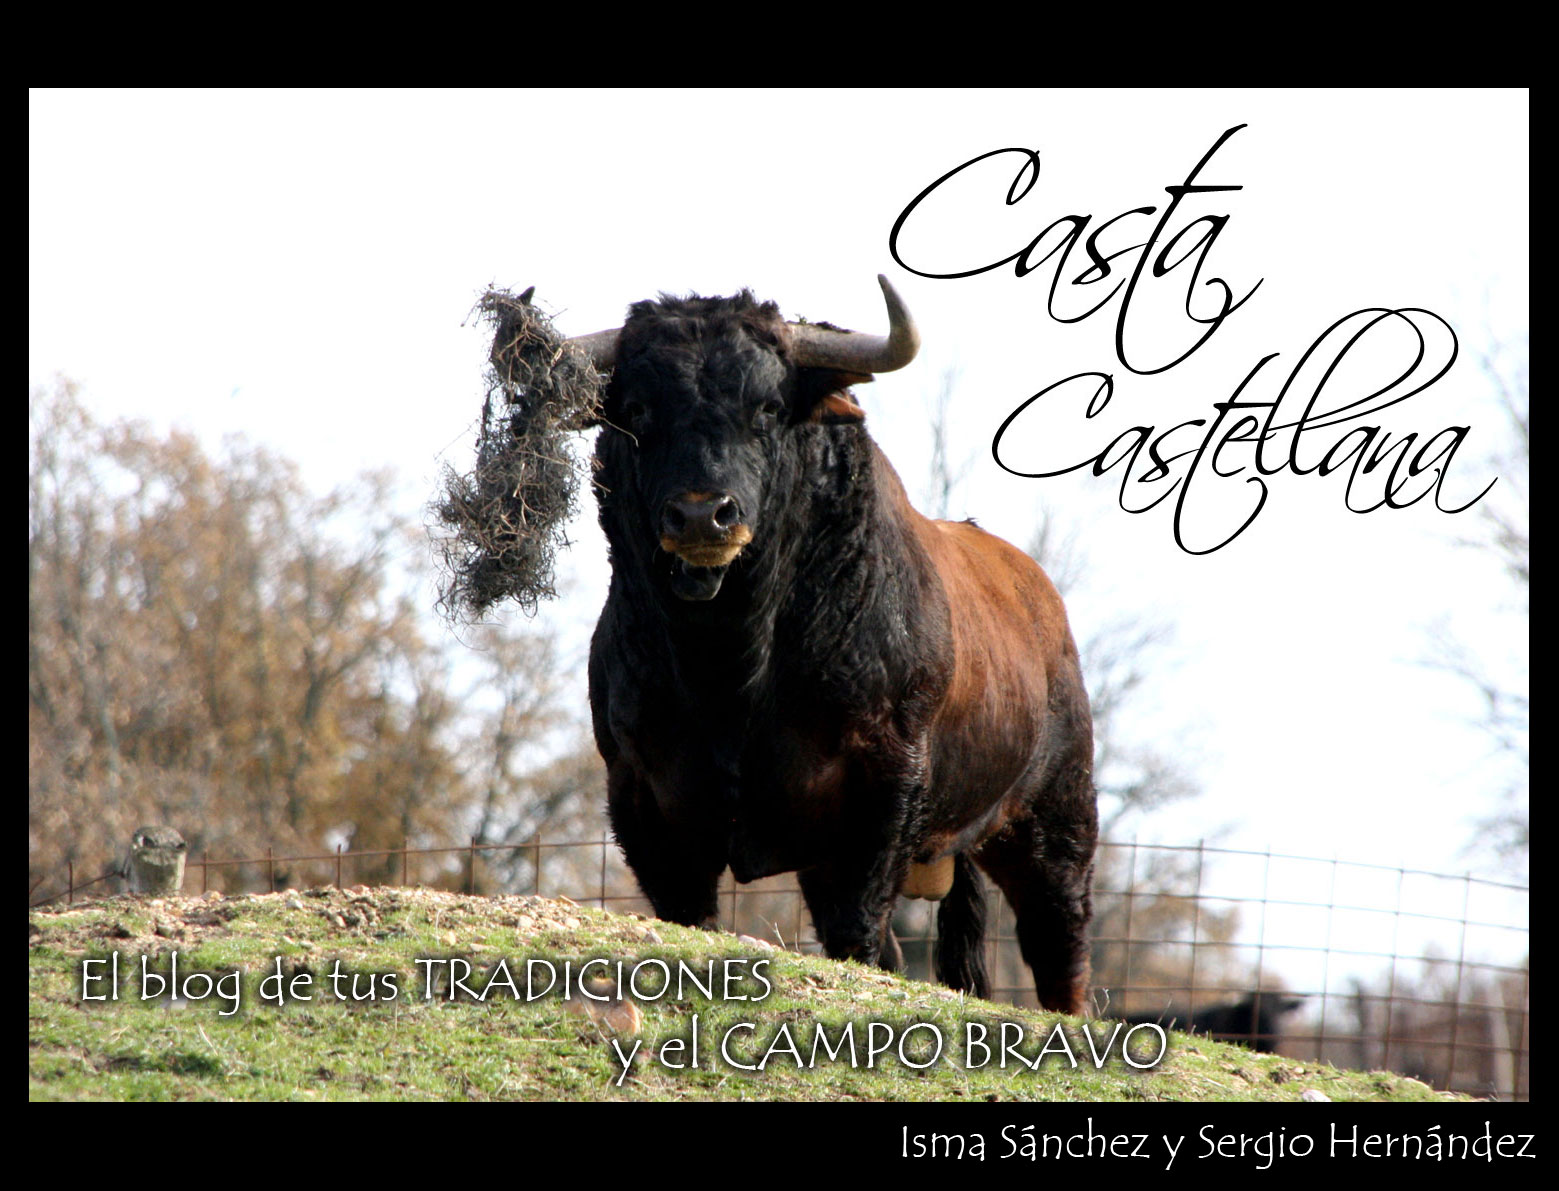 Casta Castellana